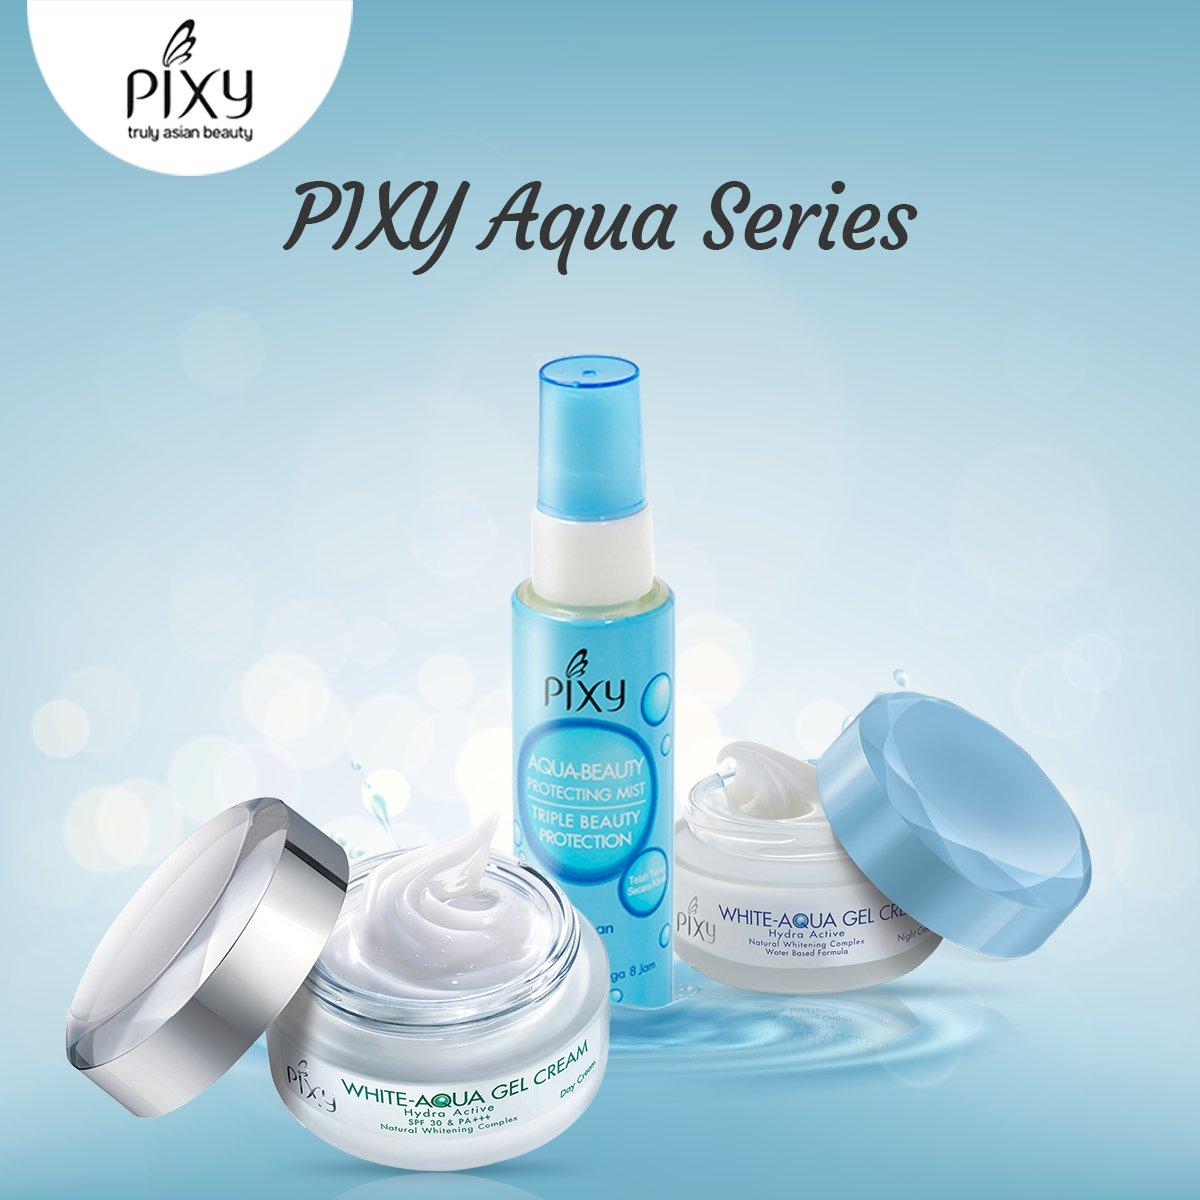 Pixy Aqua Beauty Protecting Mist Daftar Harga Terlengkap Indonesia Spray 60 Ml White Gel Cream Day Sebagai Krim Pagi